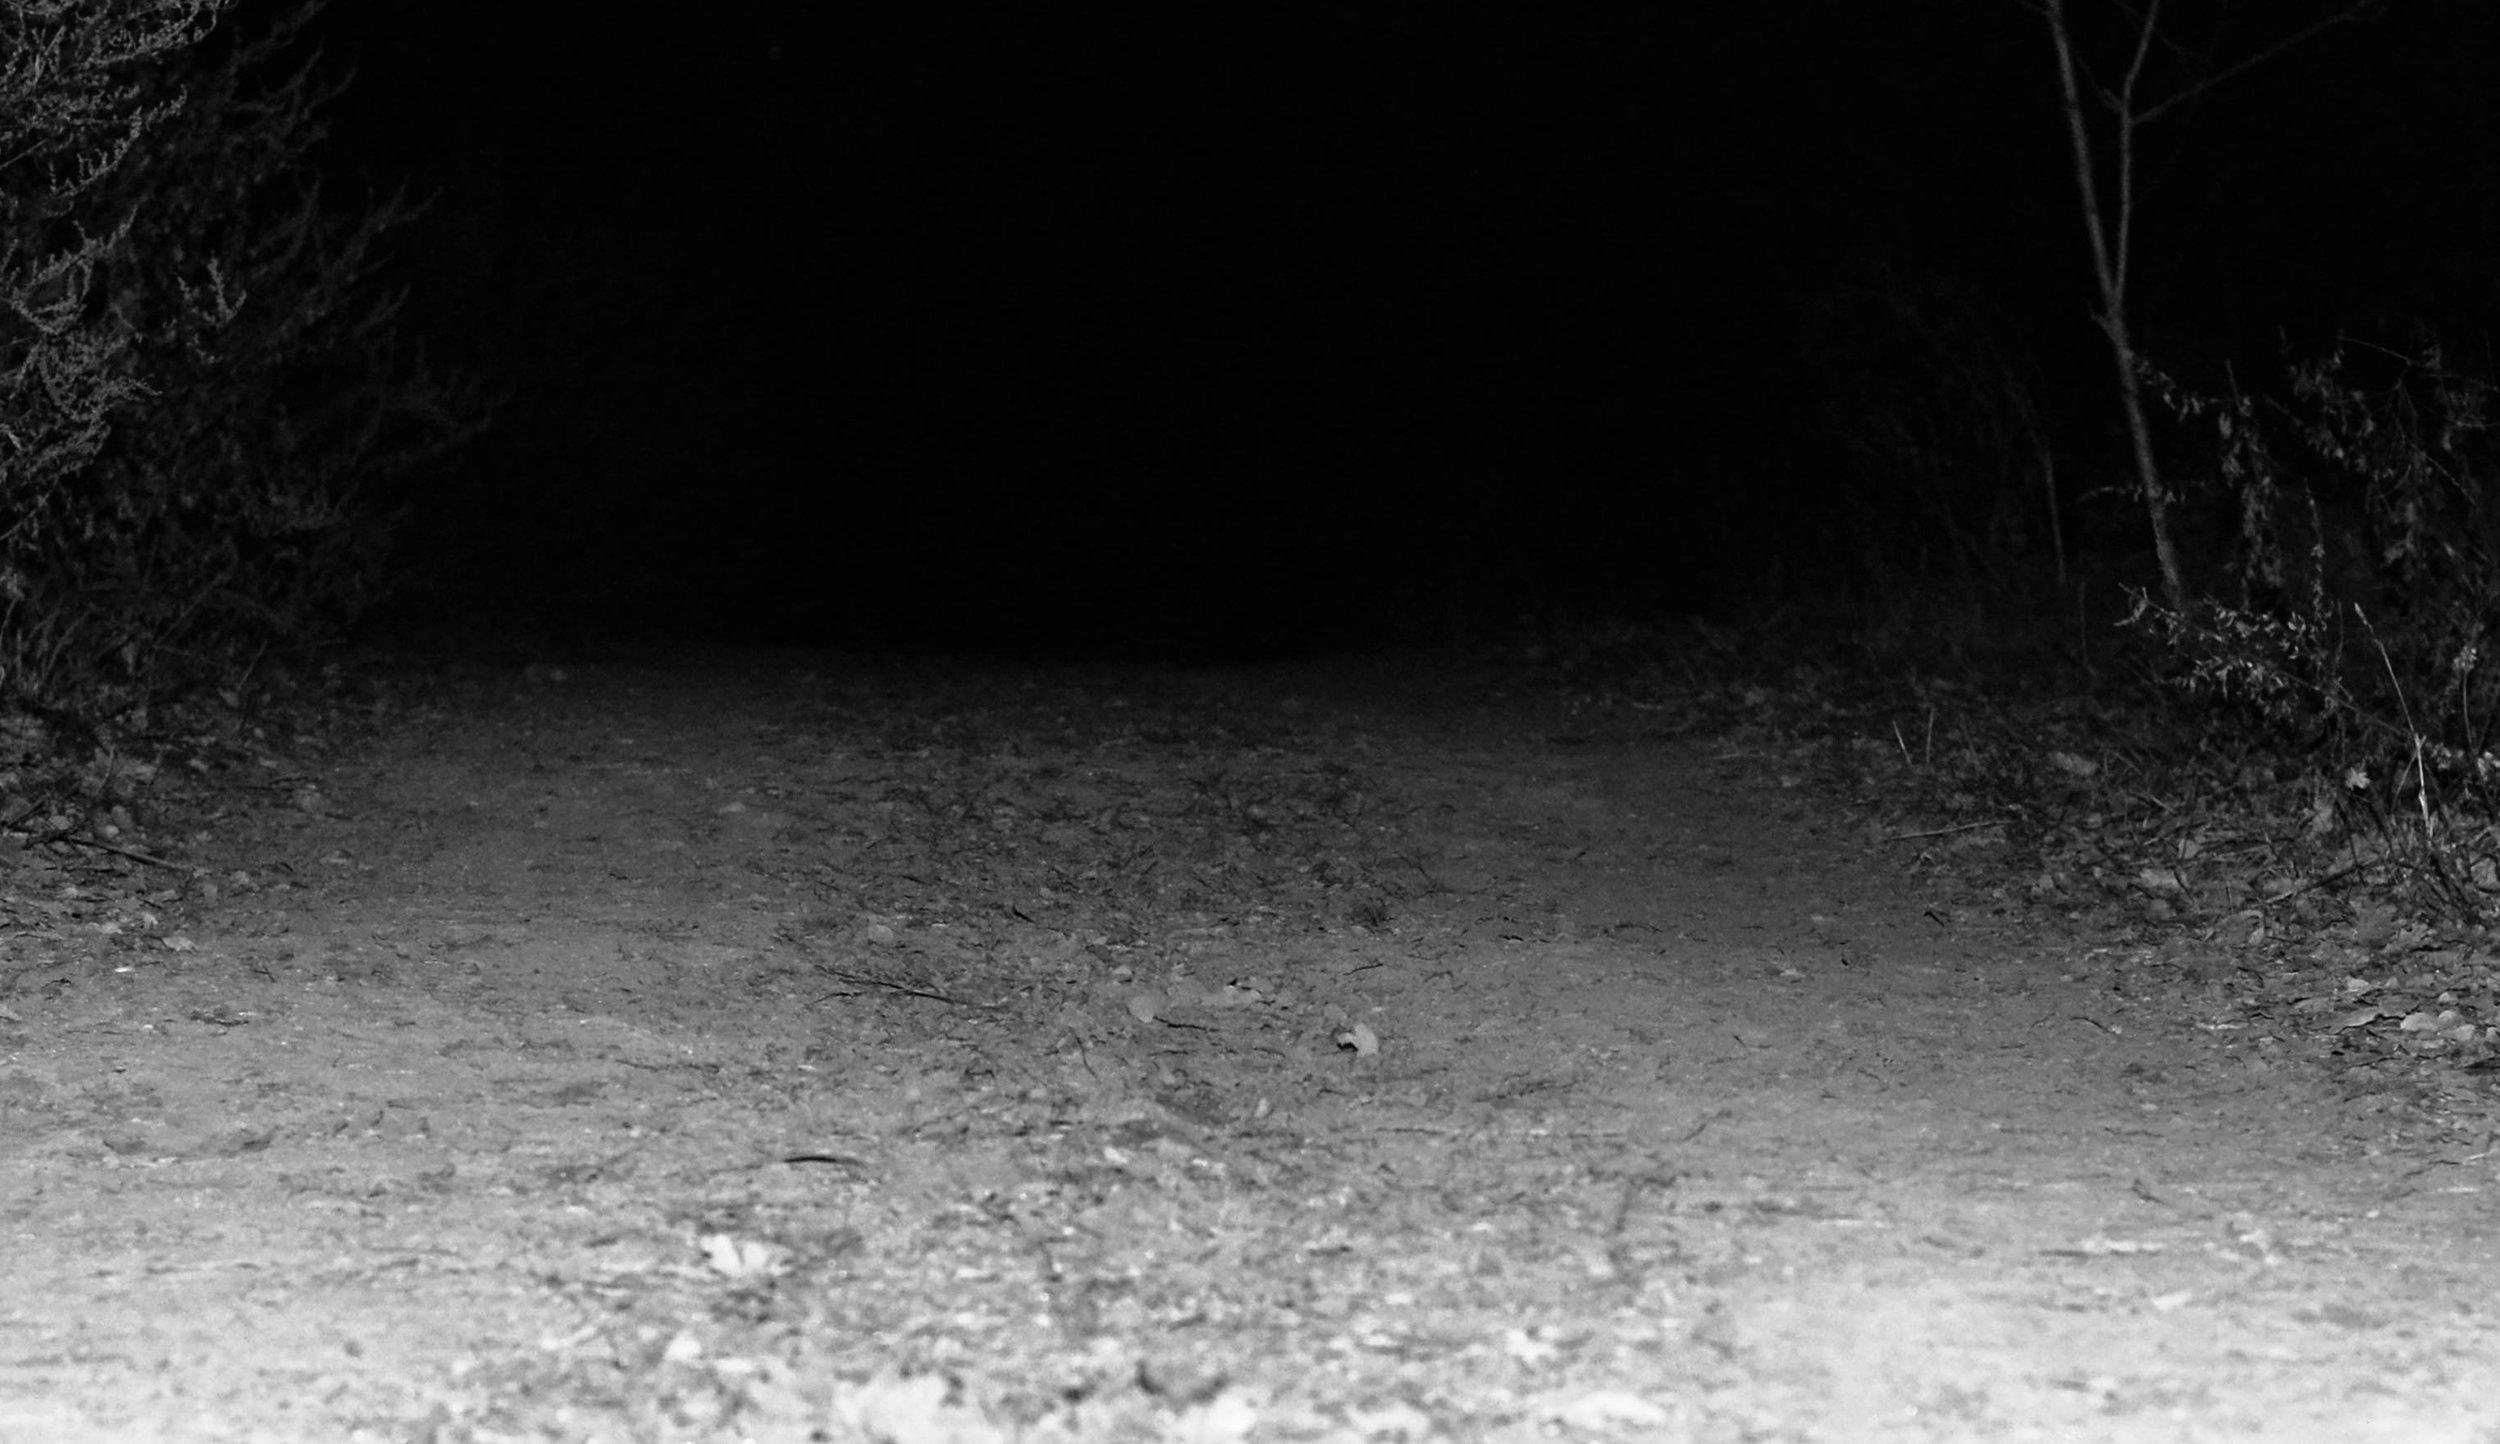 elvira-kolerova-semi-zine-photography-interview-submission-2018-9.jpg